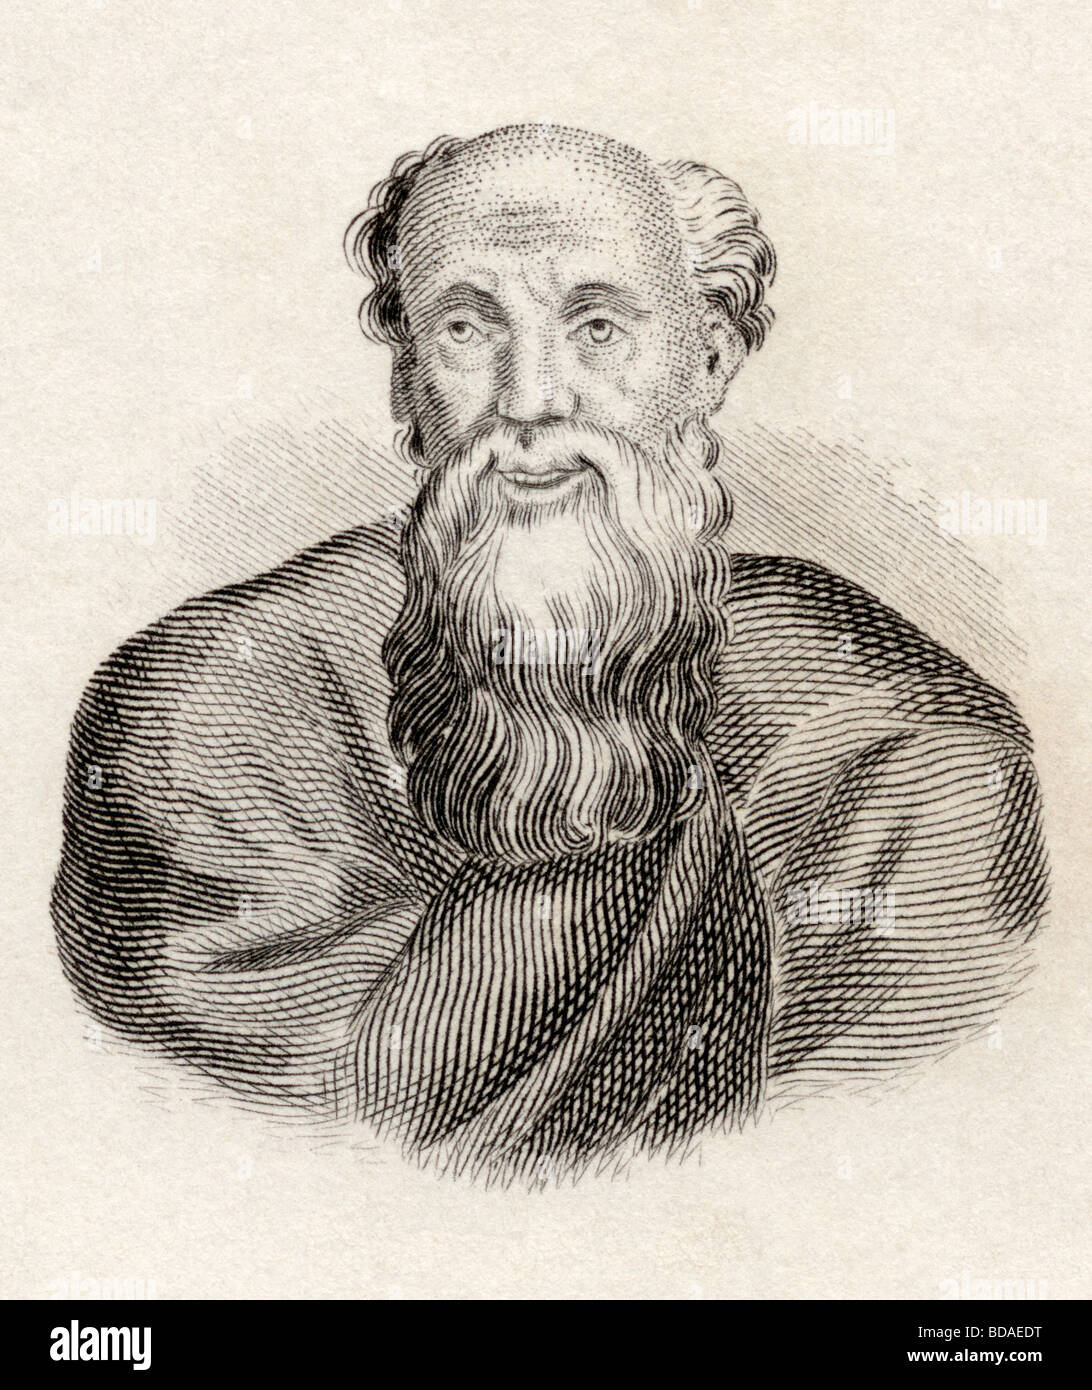 Democritus born circa 460 BC died circa 370 BC.  Ancient Greek philosopher. - Stock Image